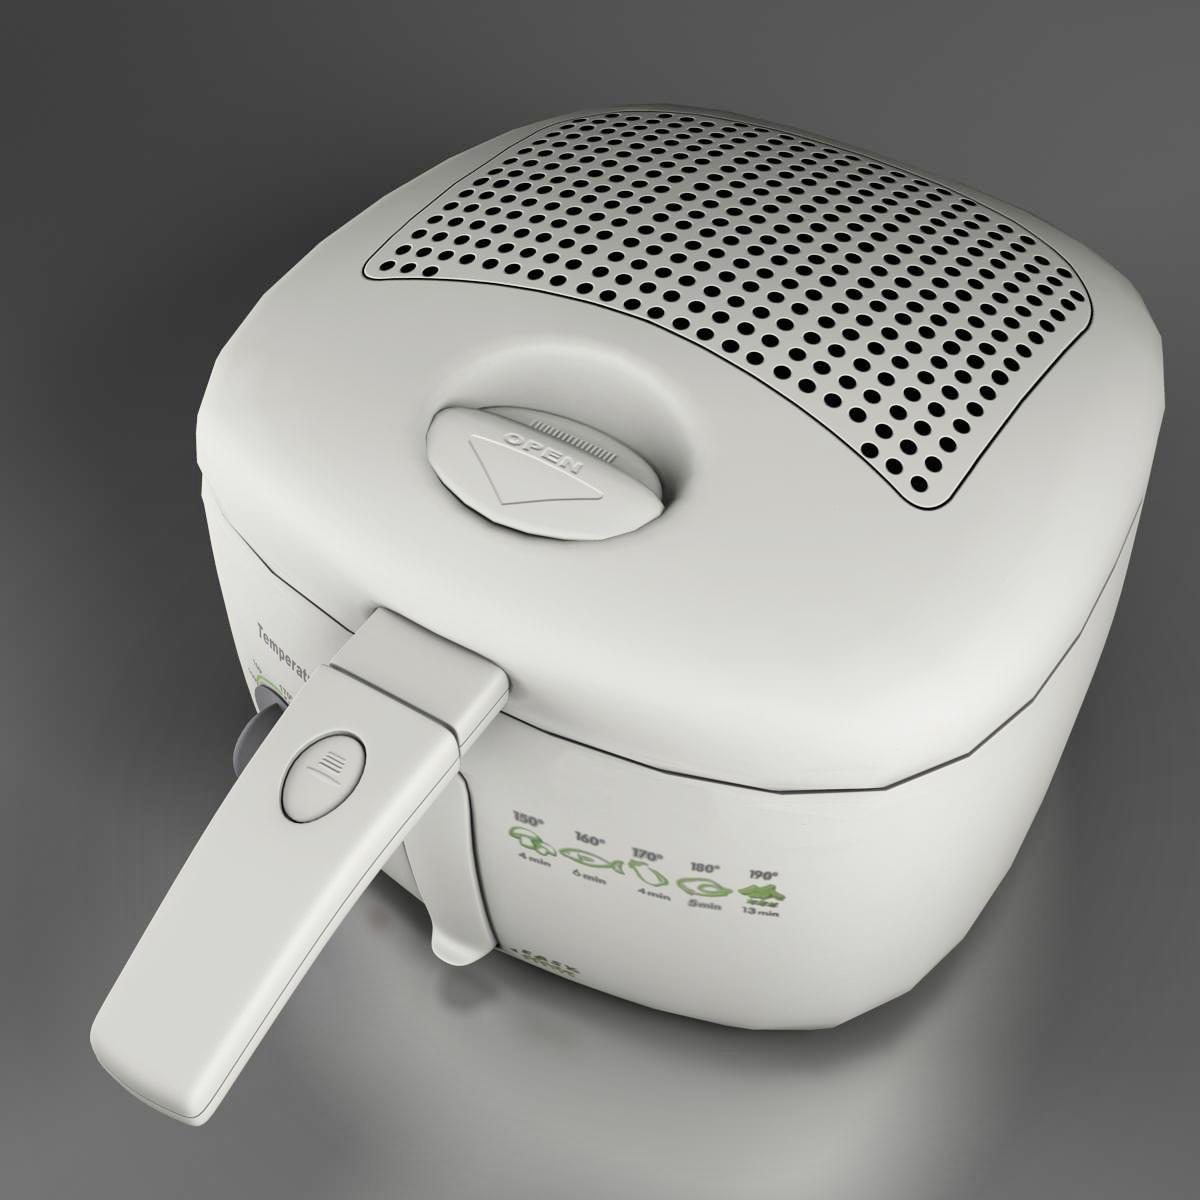 frying pan low poly 3d model 3ds max fbx ma mb obj 158932